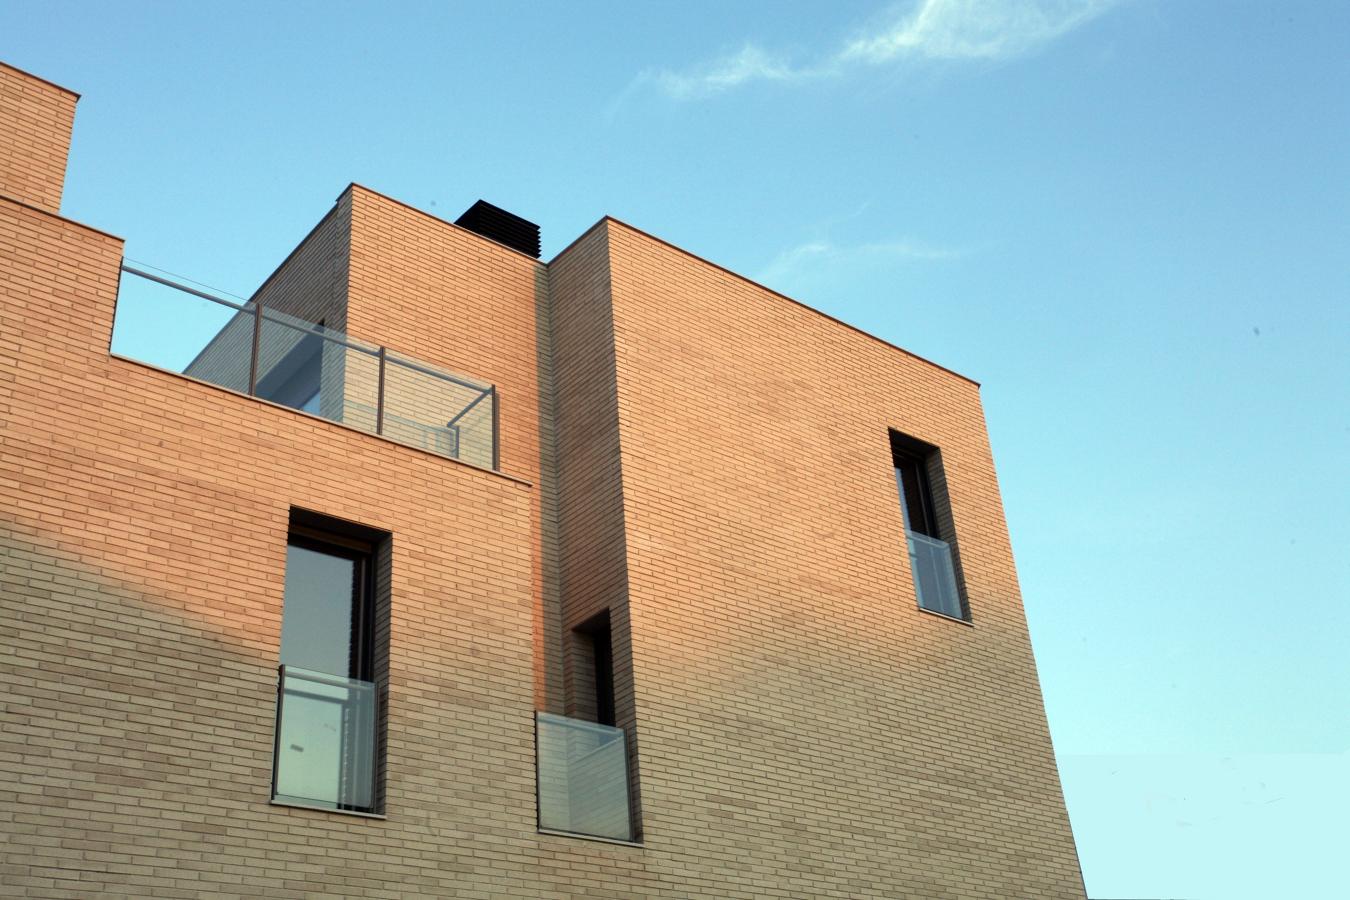 36 viviendas en Barcelona fachada sur detalle